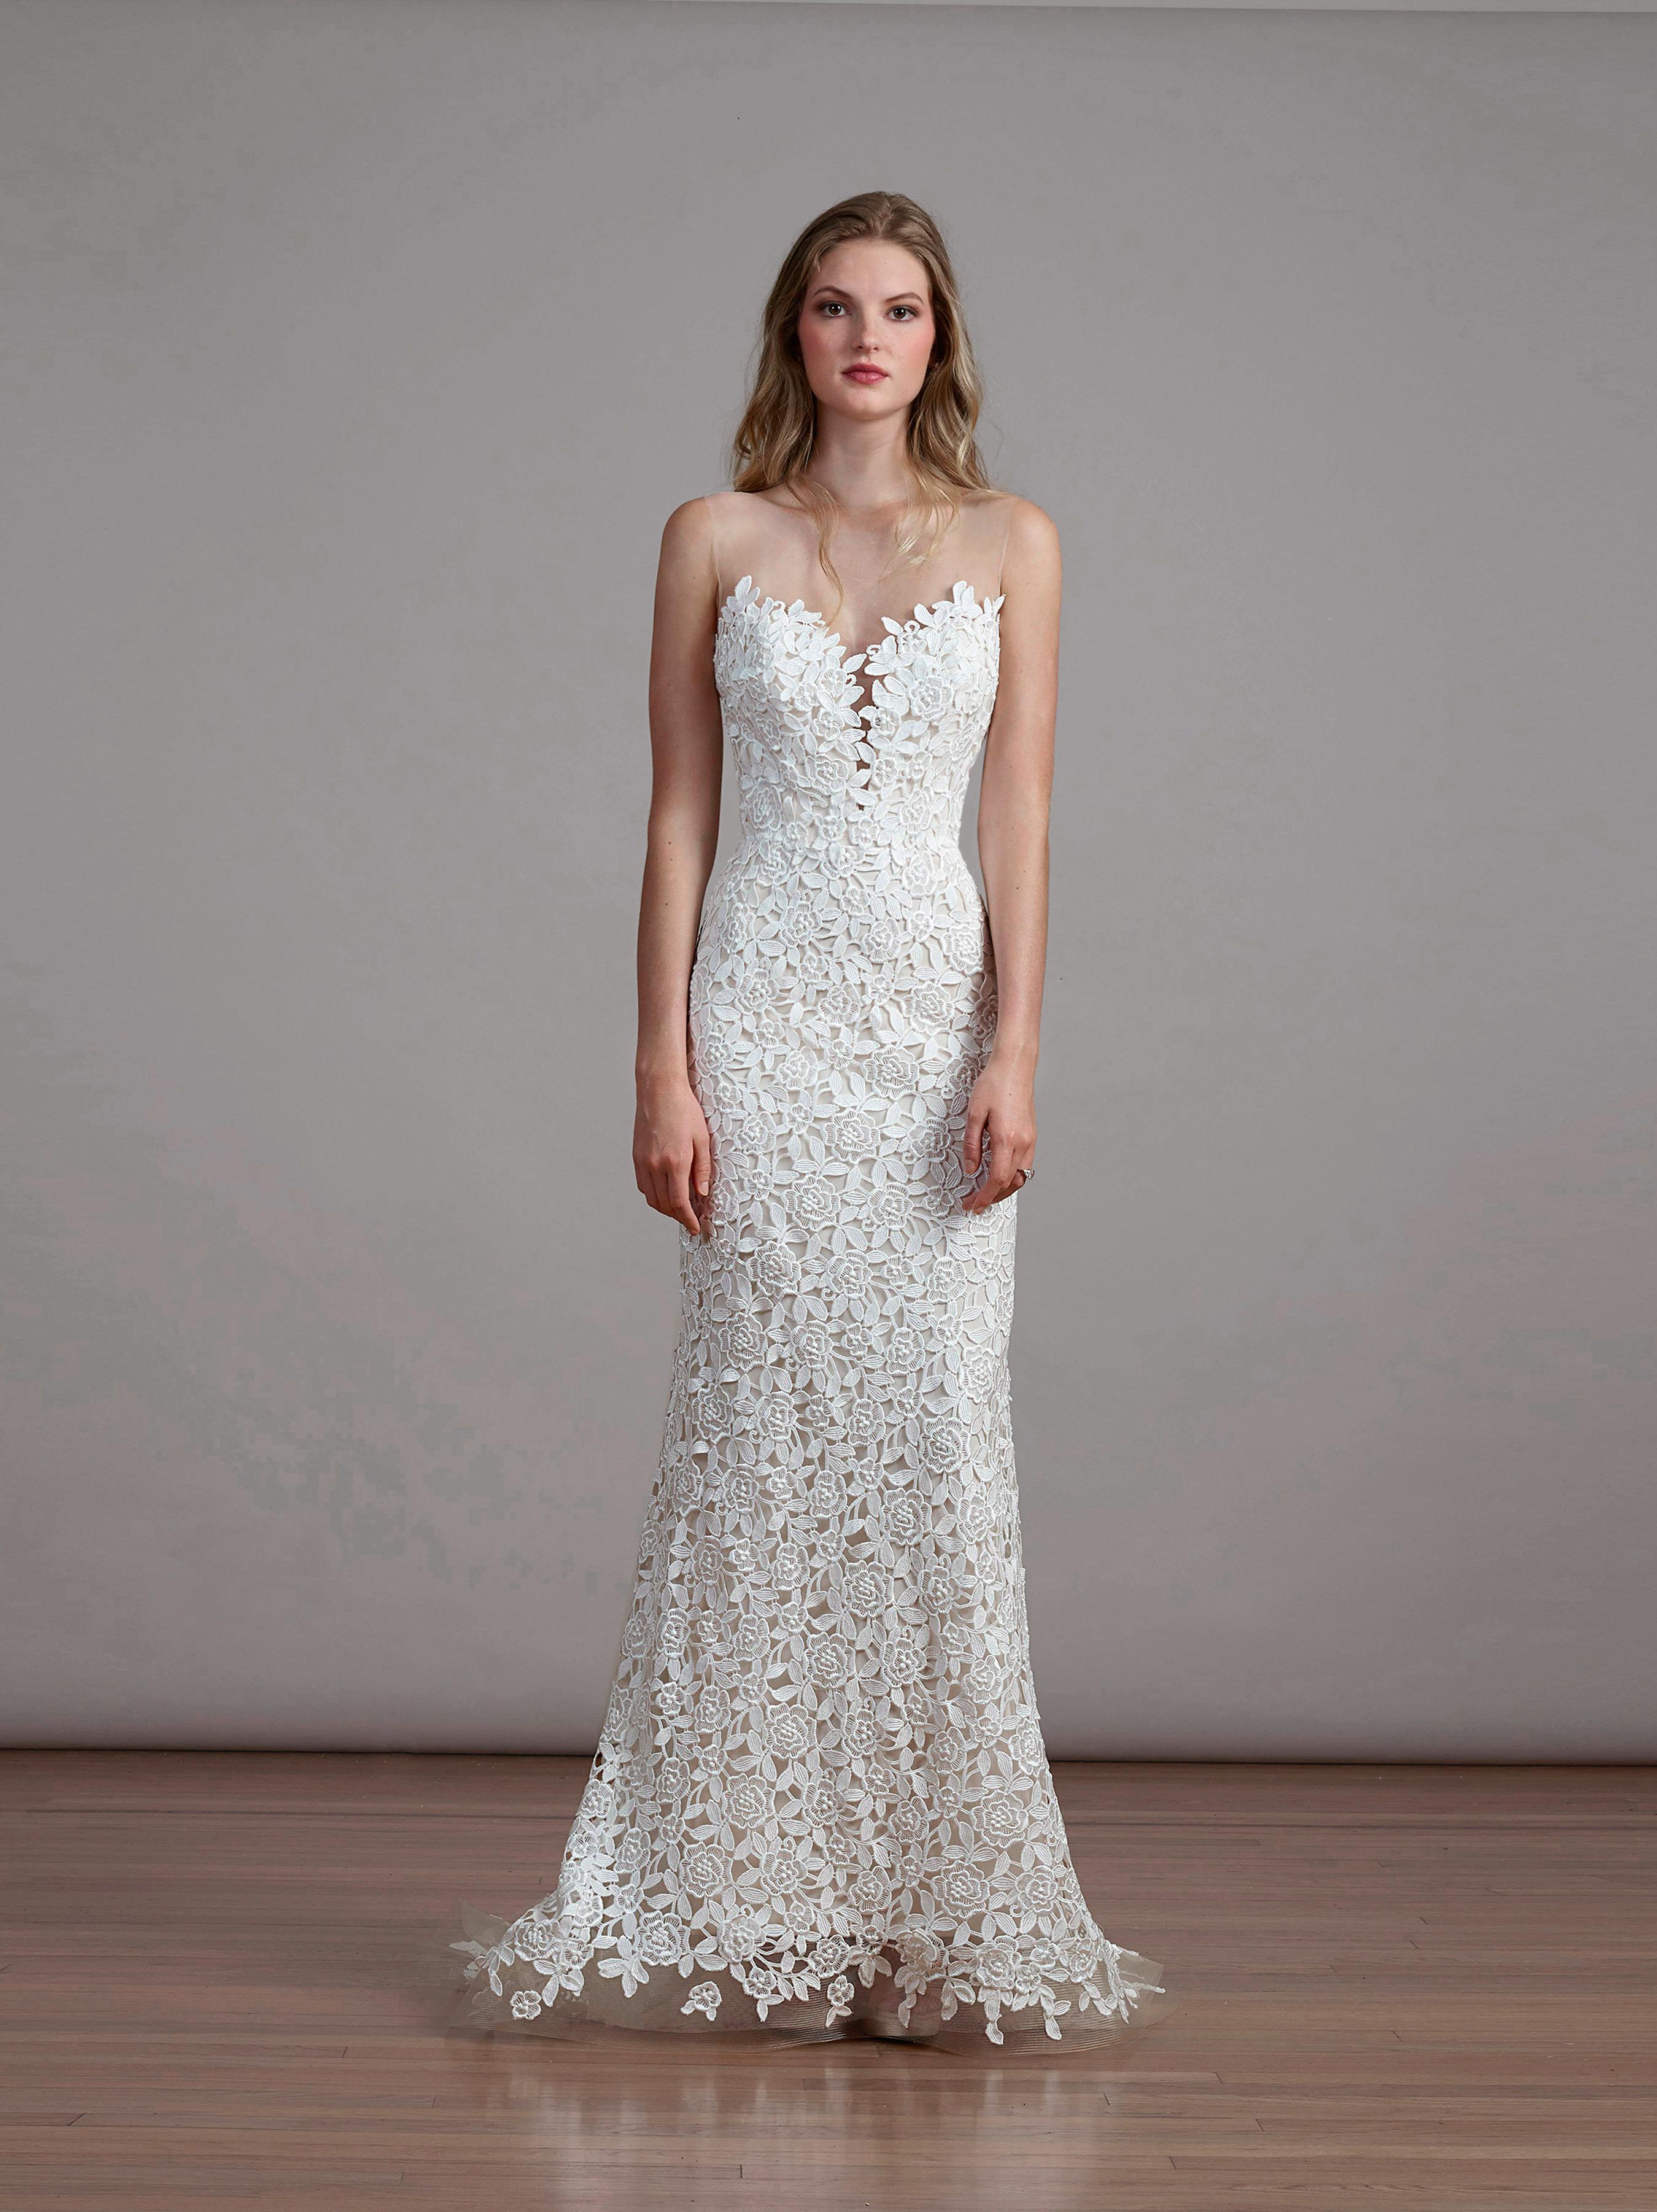 Liancarlo wedding dress with illusion neckline